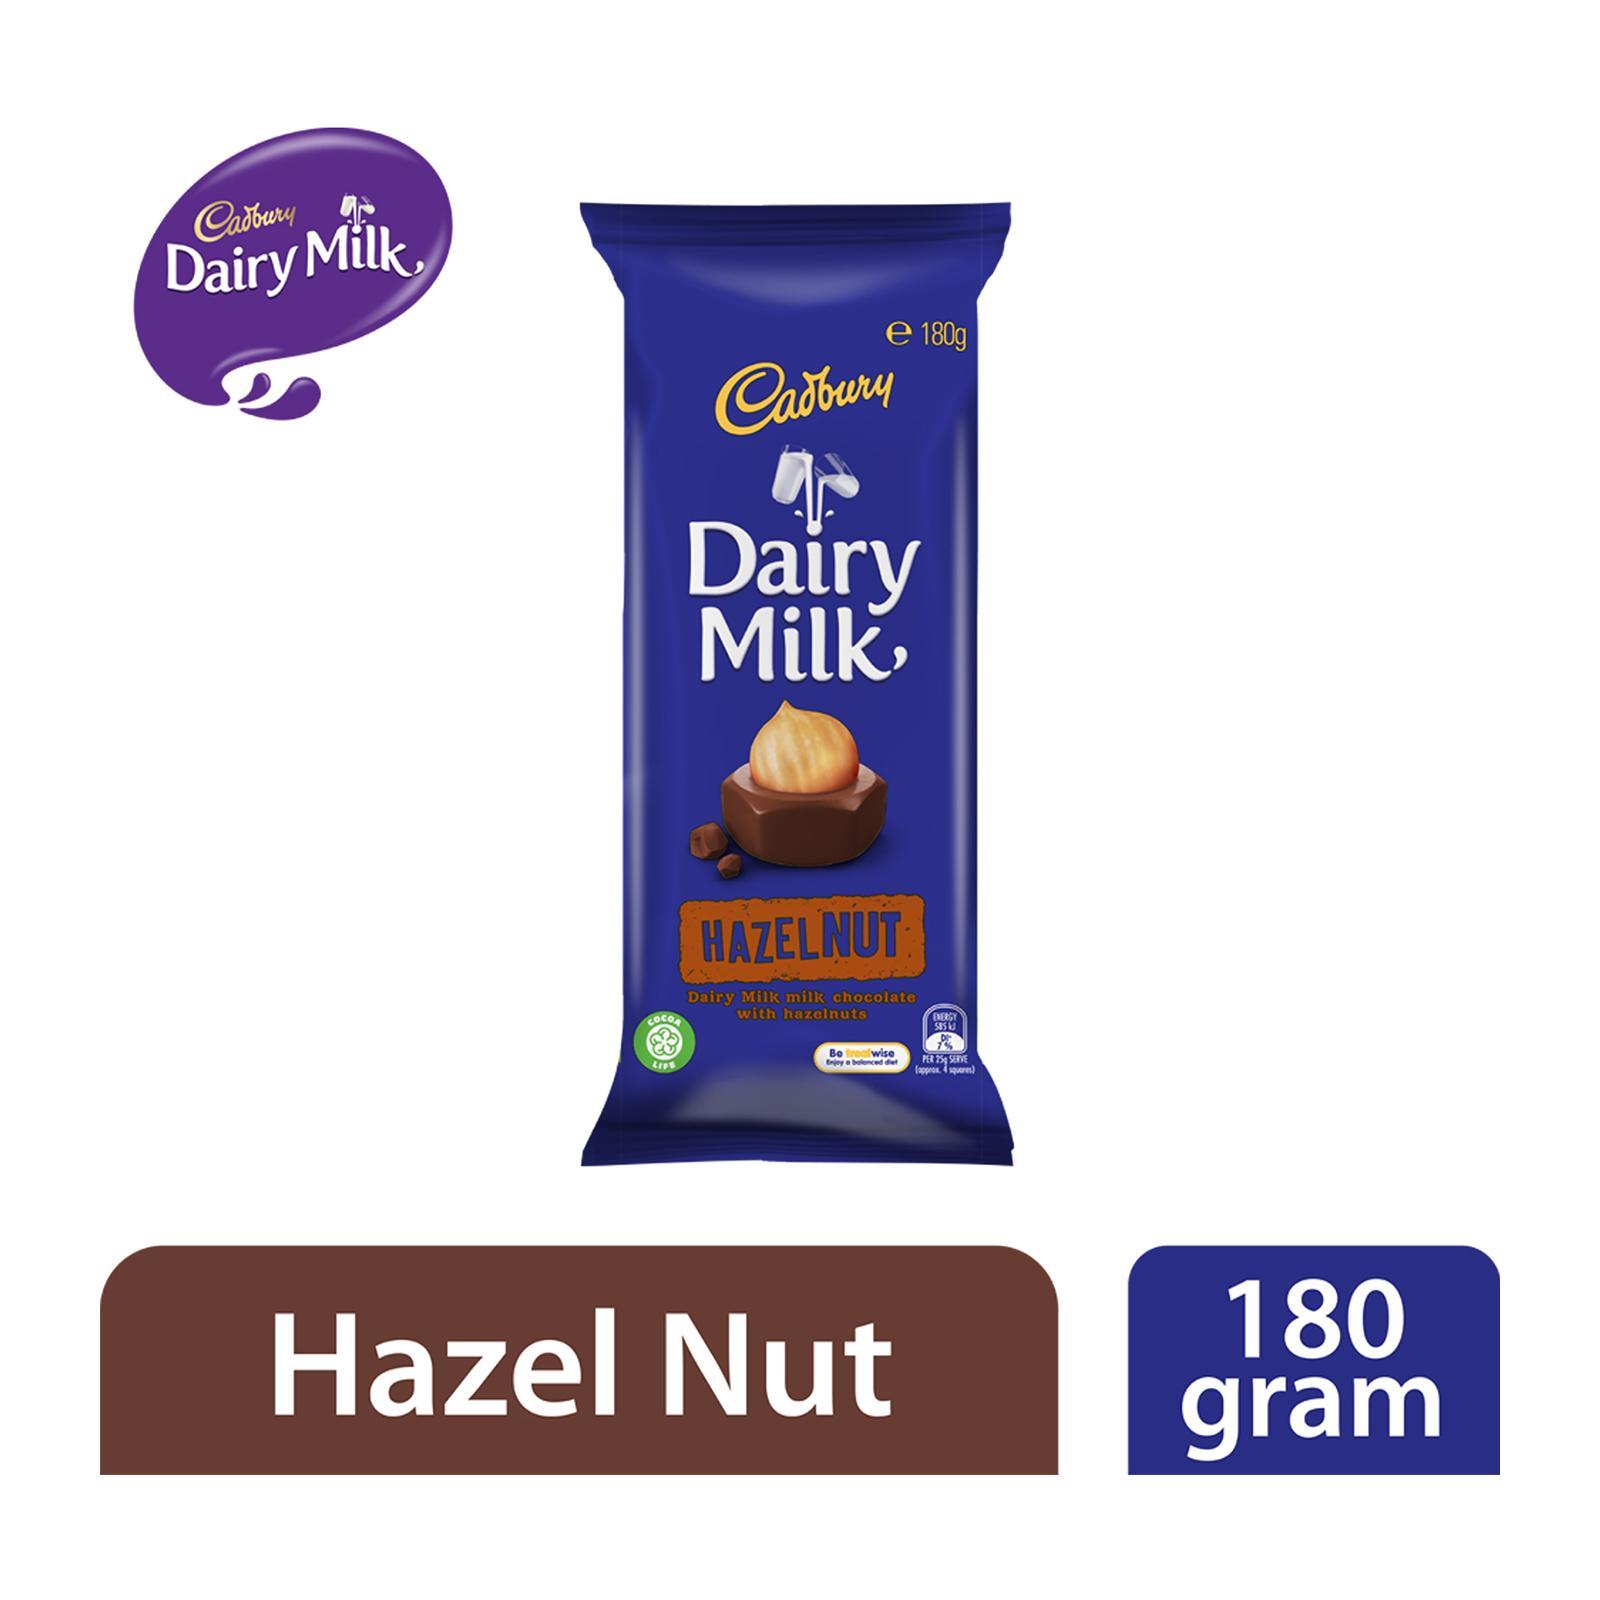 Cadbury Dairy Milk Hazelnut Milk Chocolate Block